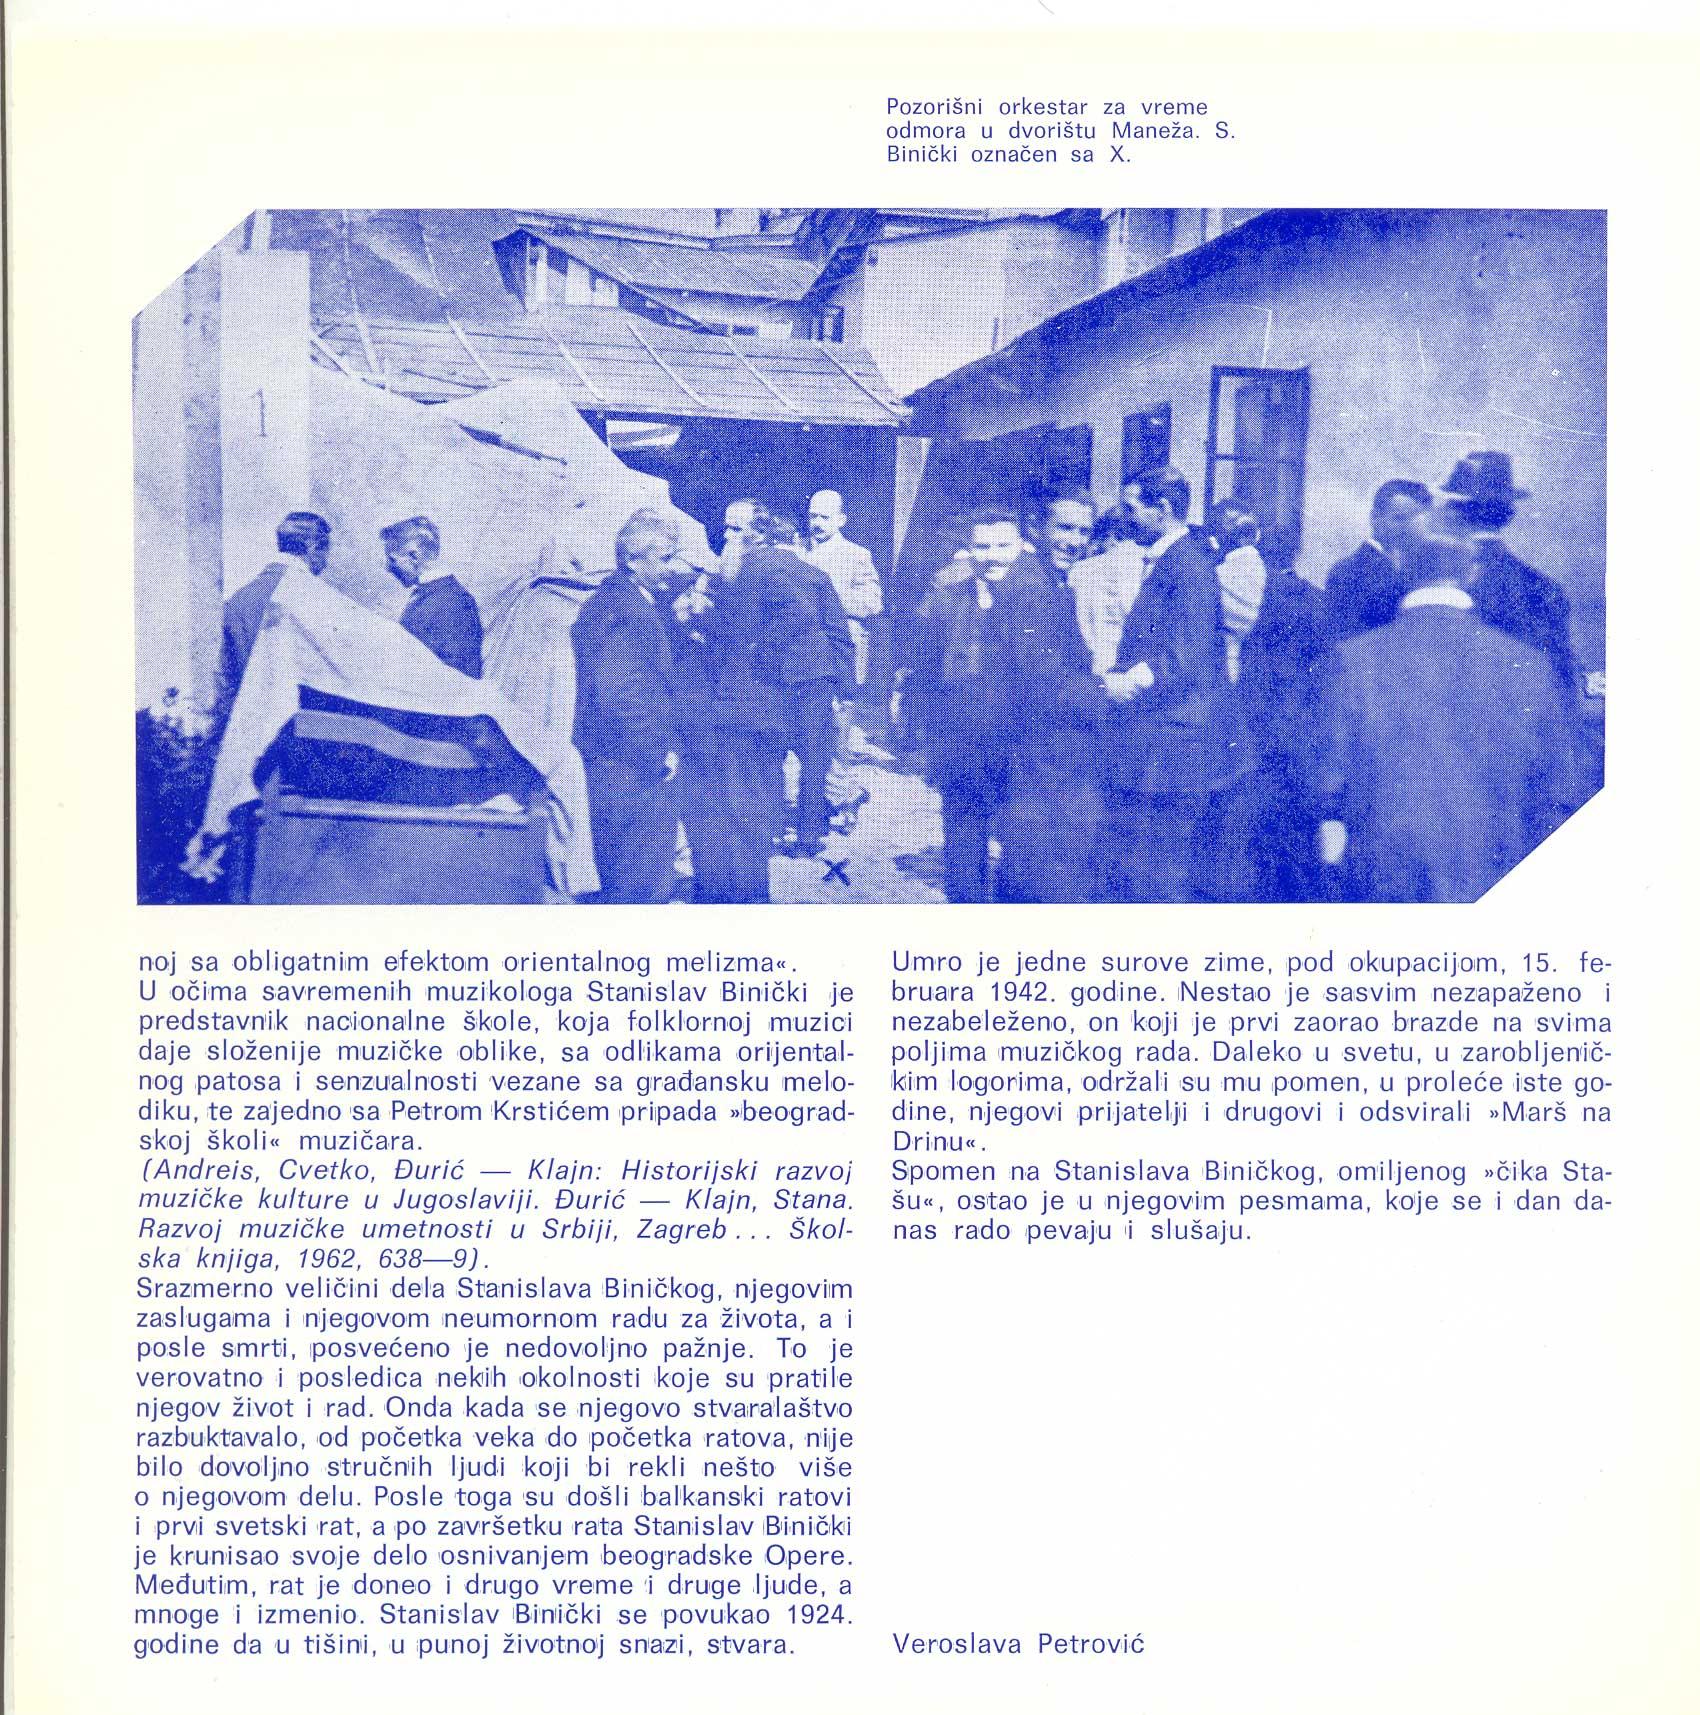 stanislav-binicki-katalog-1973-18